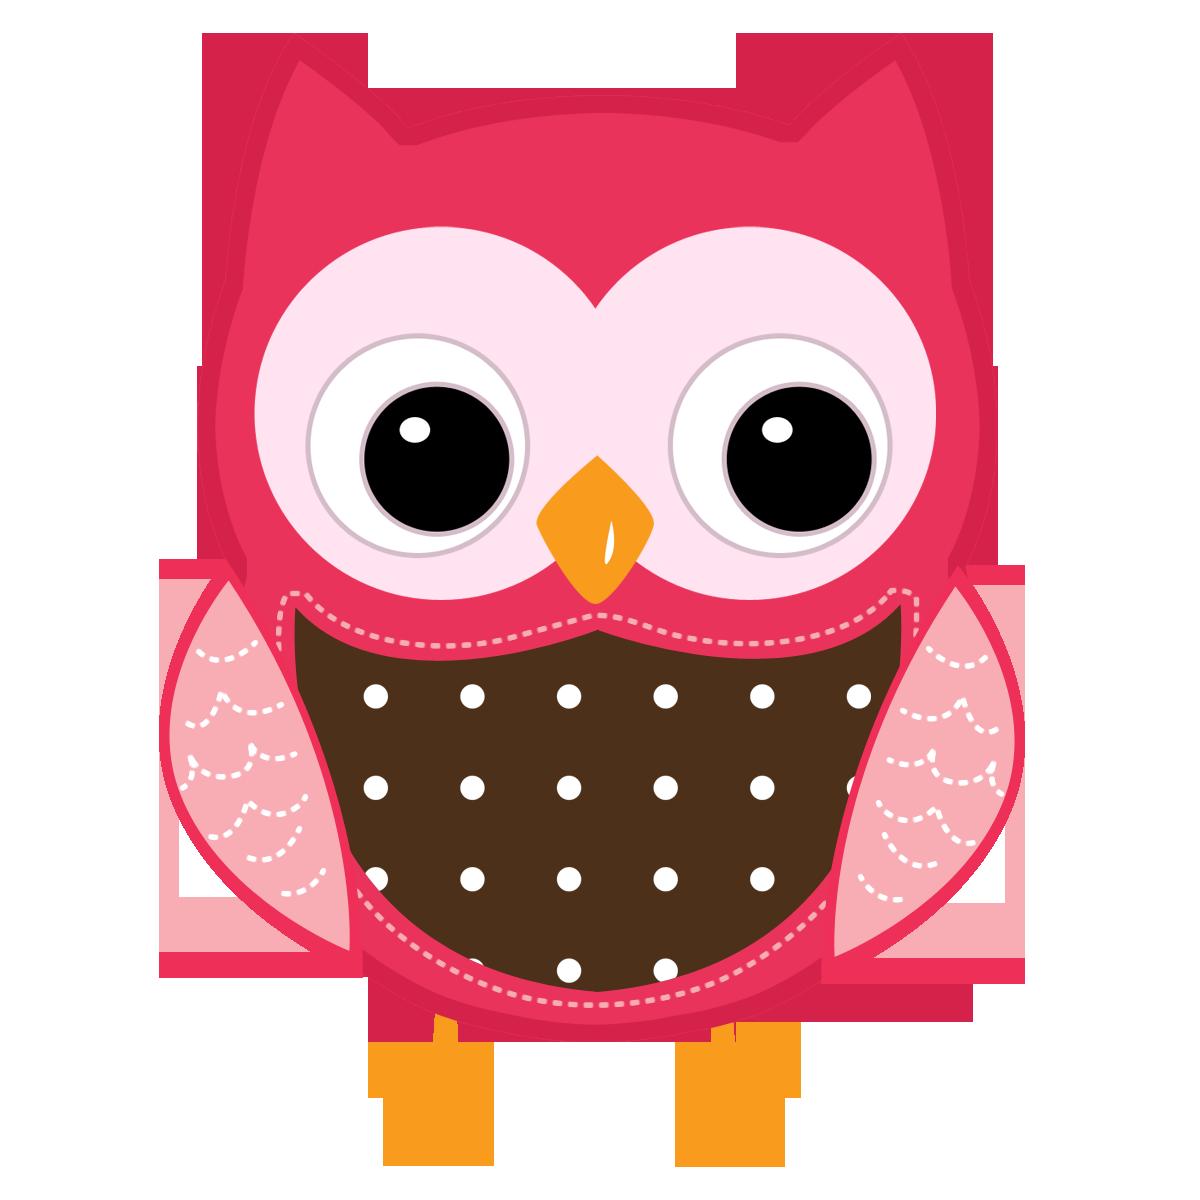 February boy owl clipart clipart stock February boy owl clipart - ClipartFest clipart stock